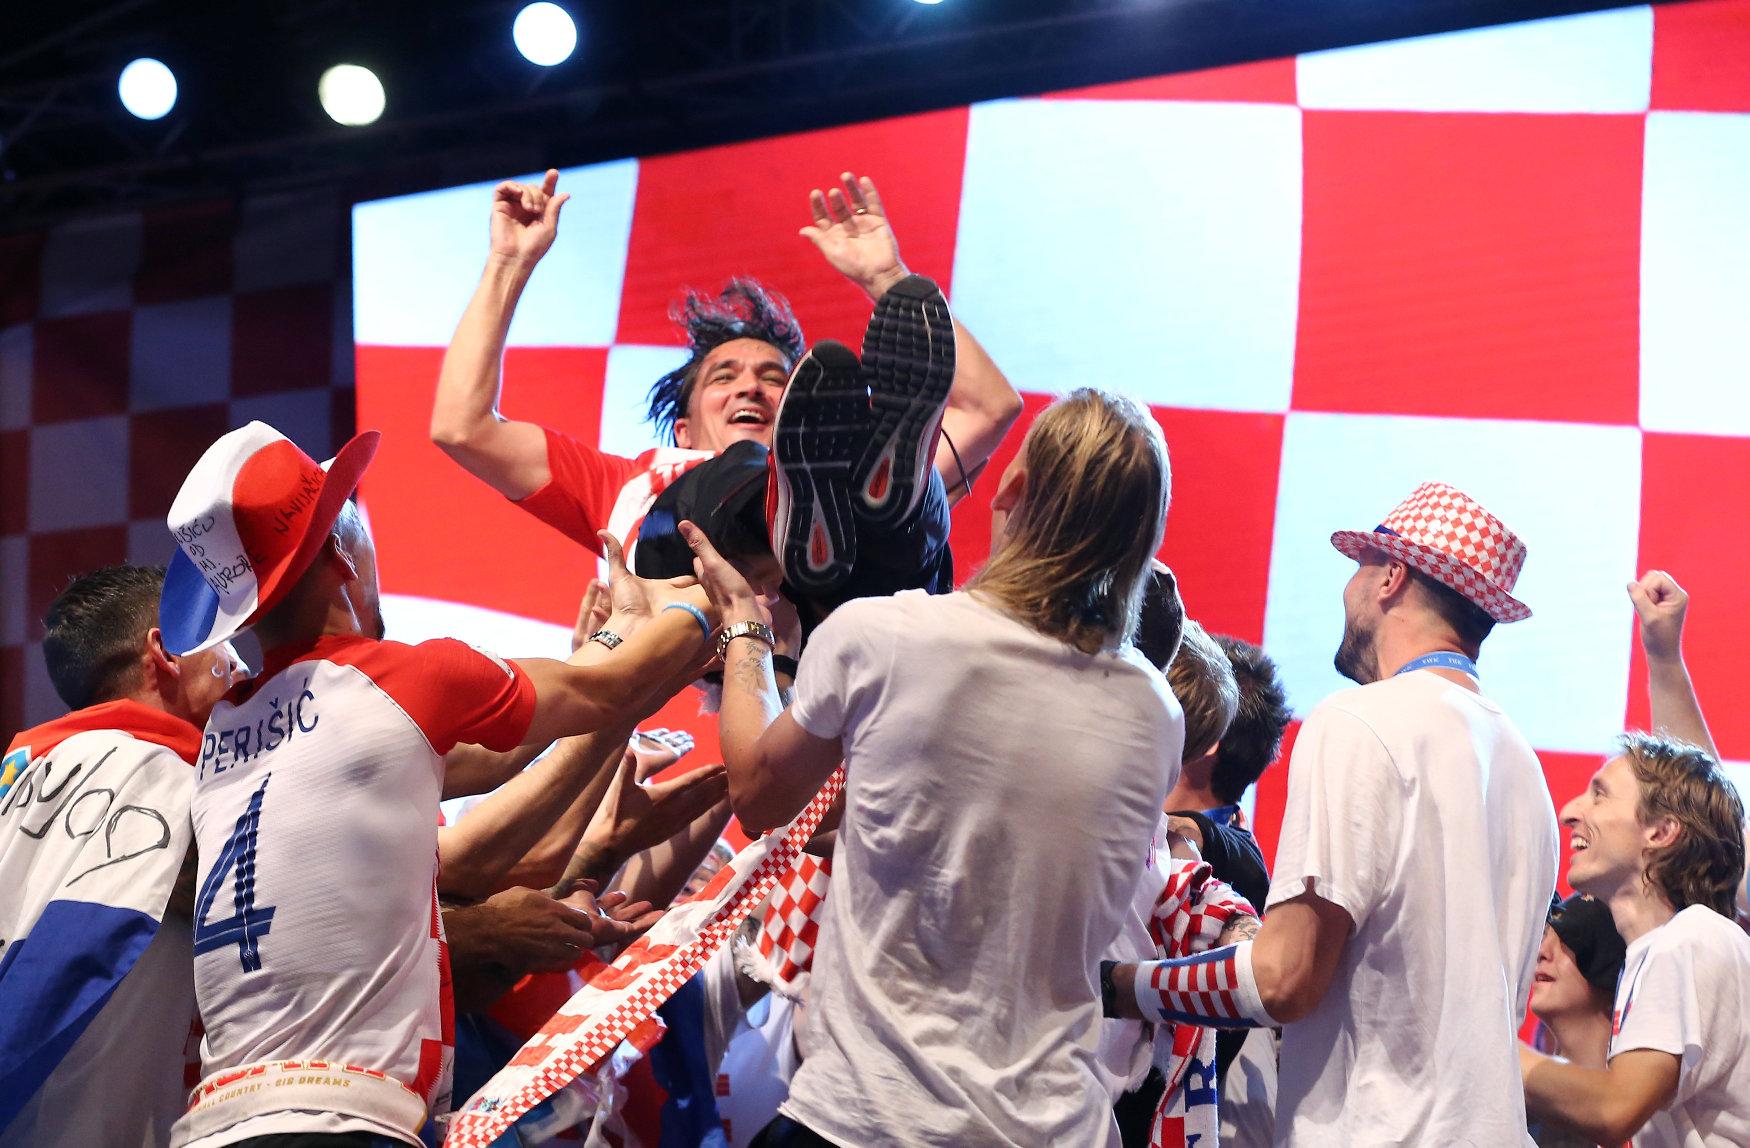 Soccer Football - World Cup - The Croatia team return from the World Cup in Russia - Zagreb, Croatia - July 16, 2018   Croatia players throw Croatia coach Zlatko Dalic in the air   REUTERS/Antonio Bronic